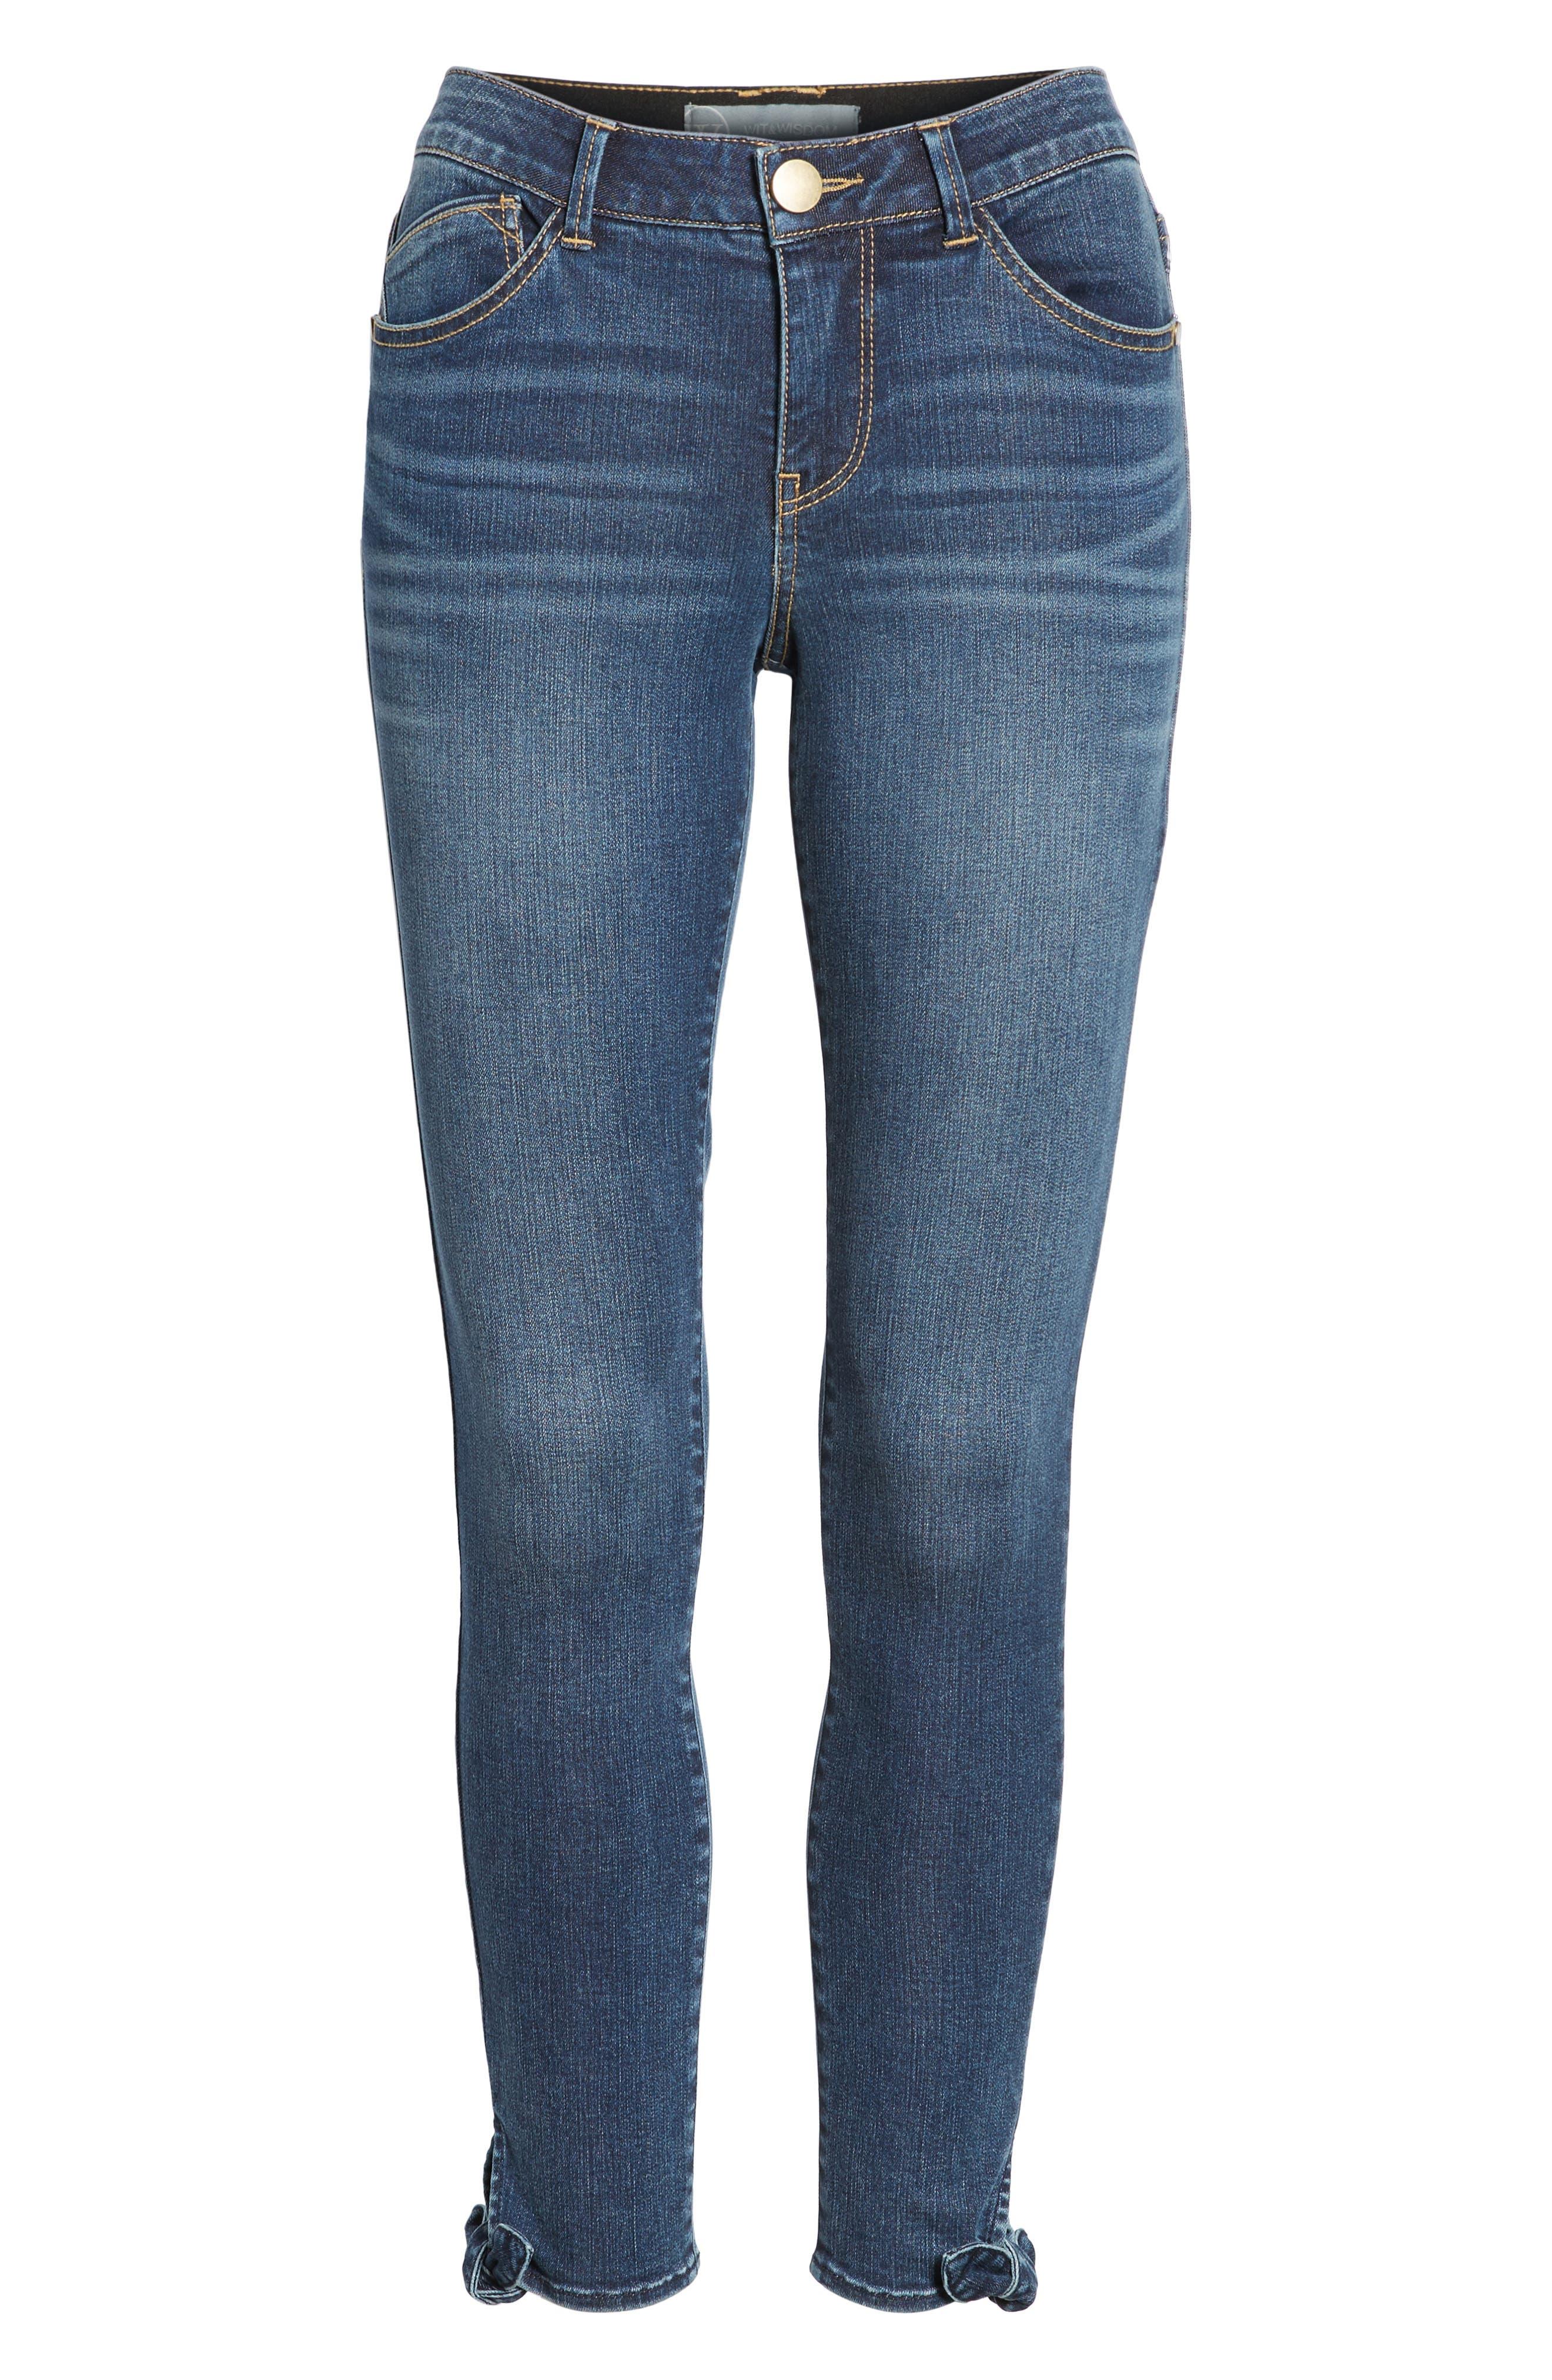 Ab-solution Ankle Skinny Skimmer Jeans,                             Alternate thumbnail 6, color,